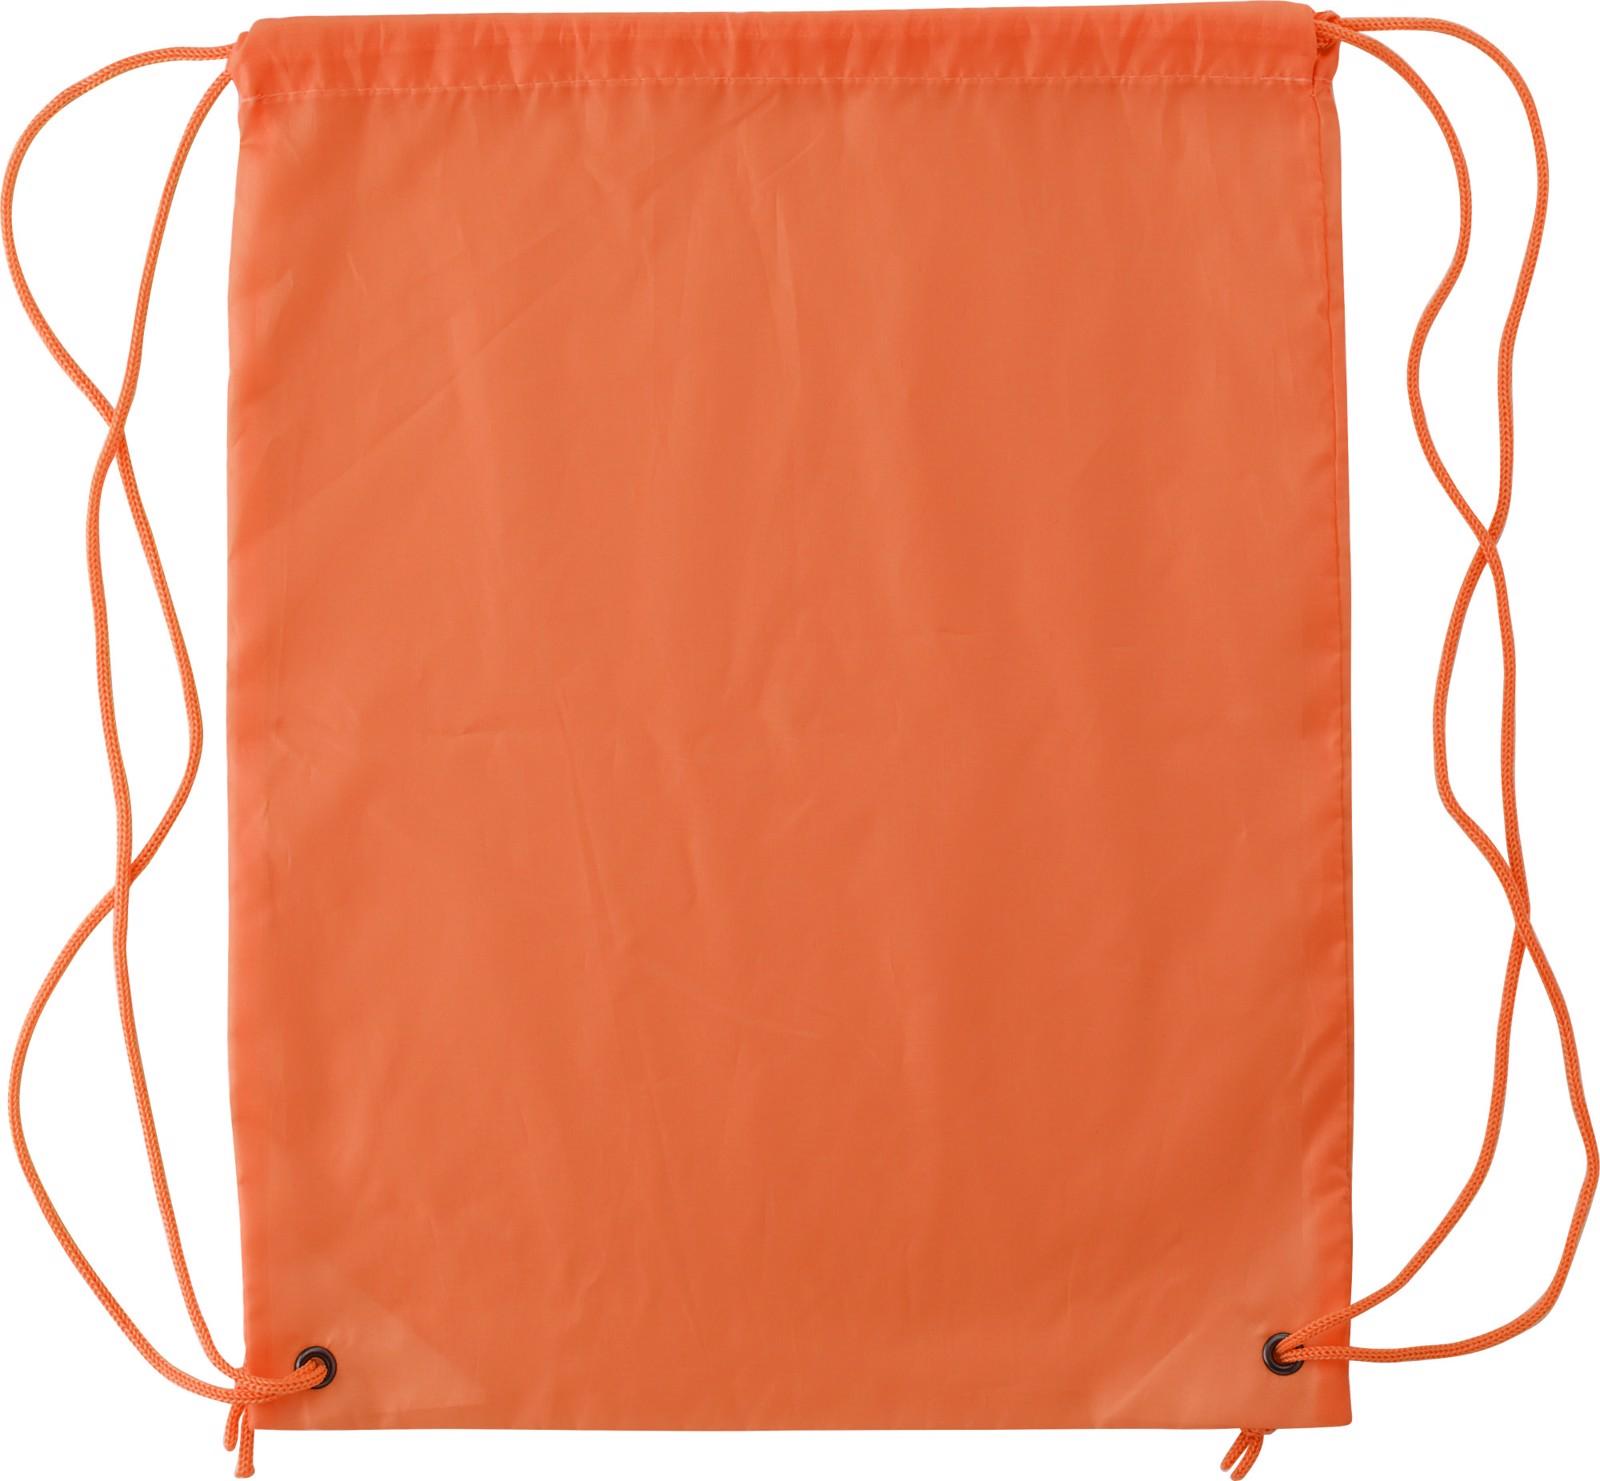 Polyester (190T) drawstring backpack - Orange